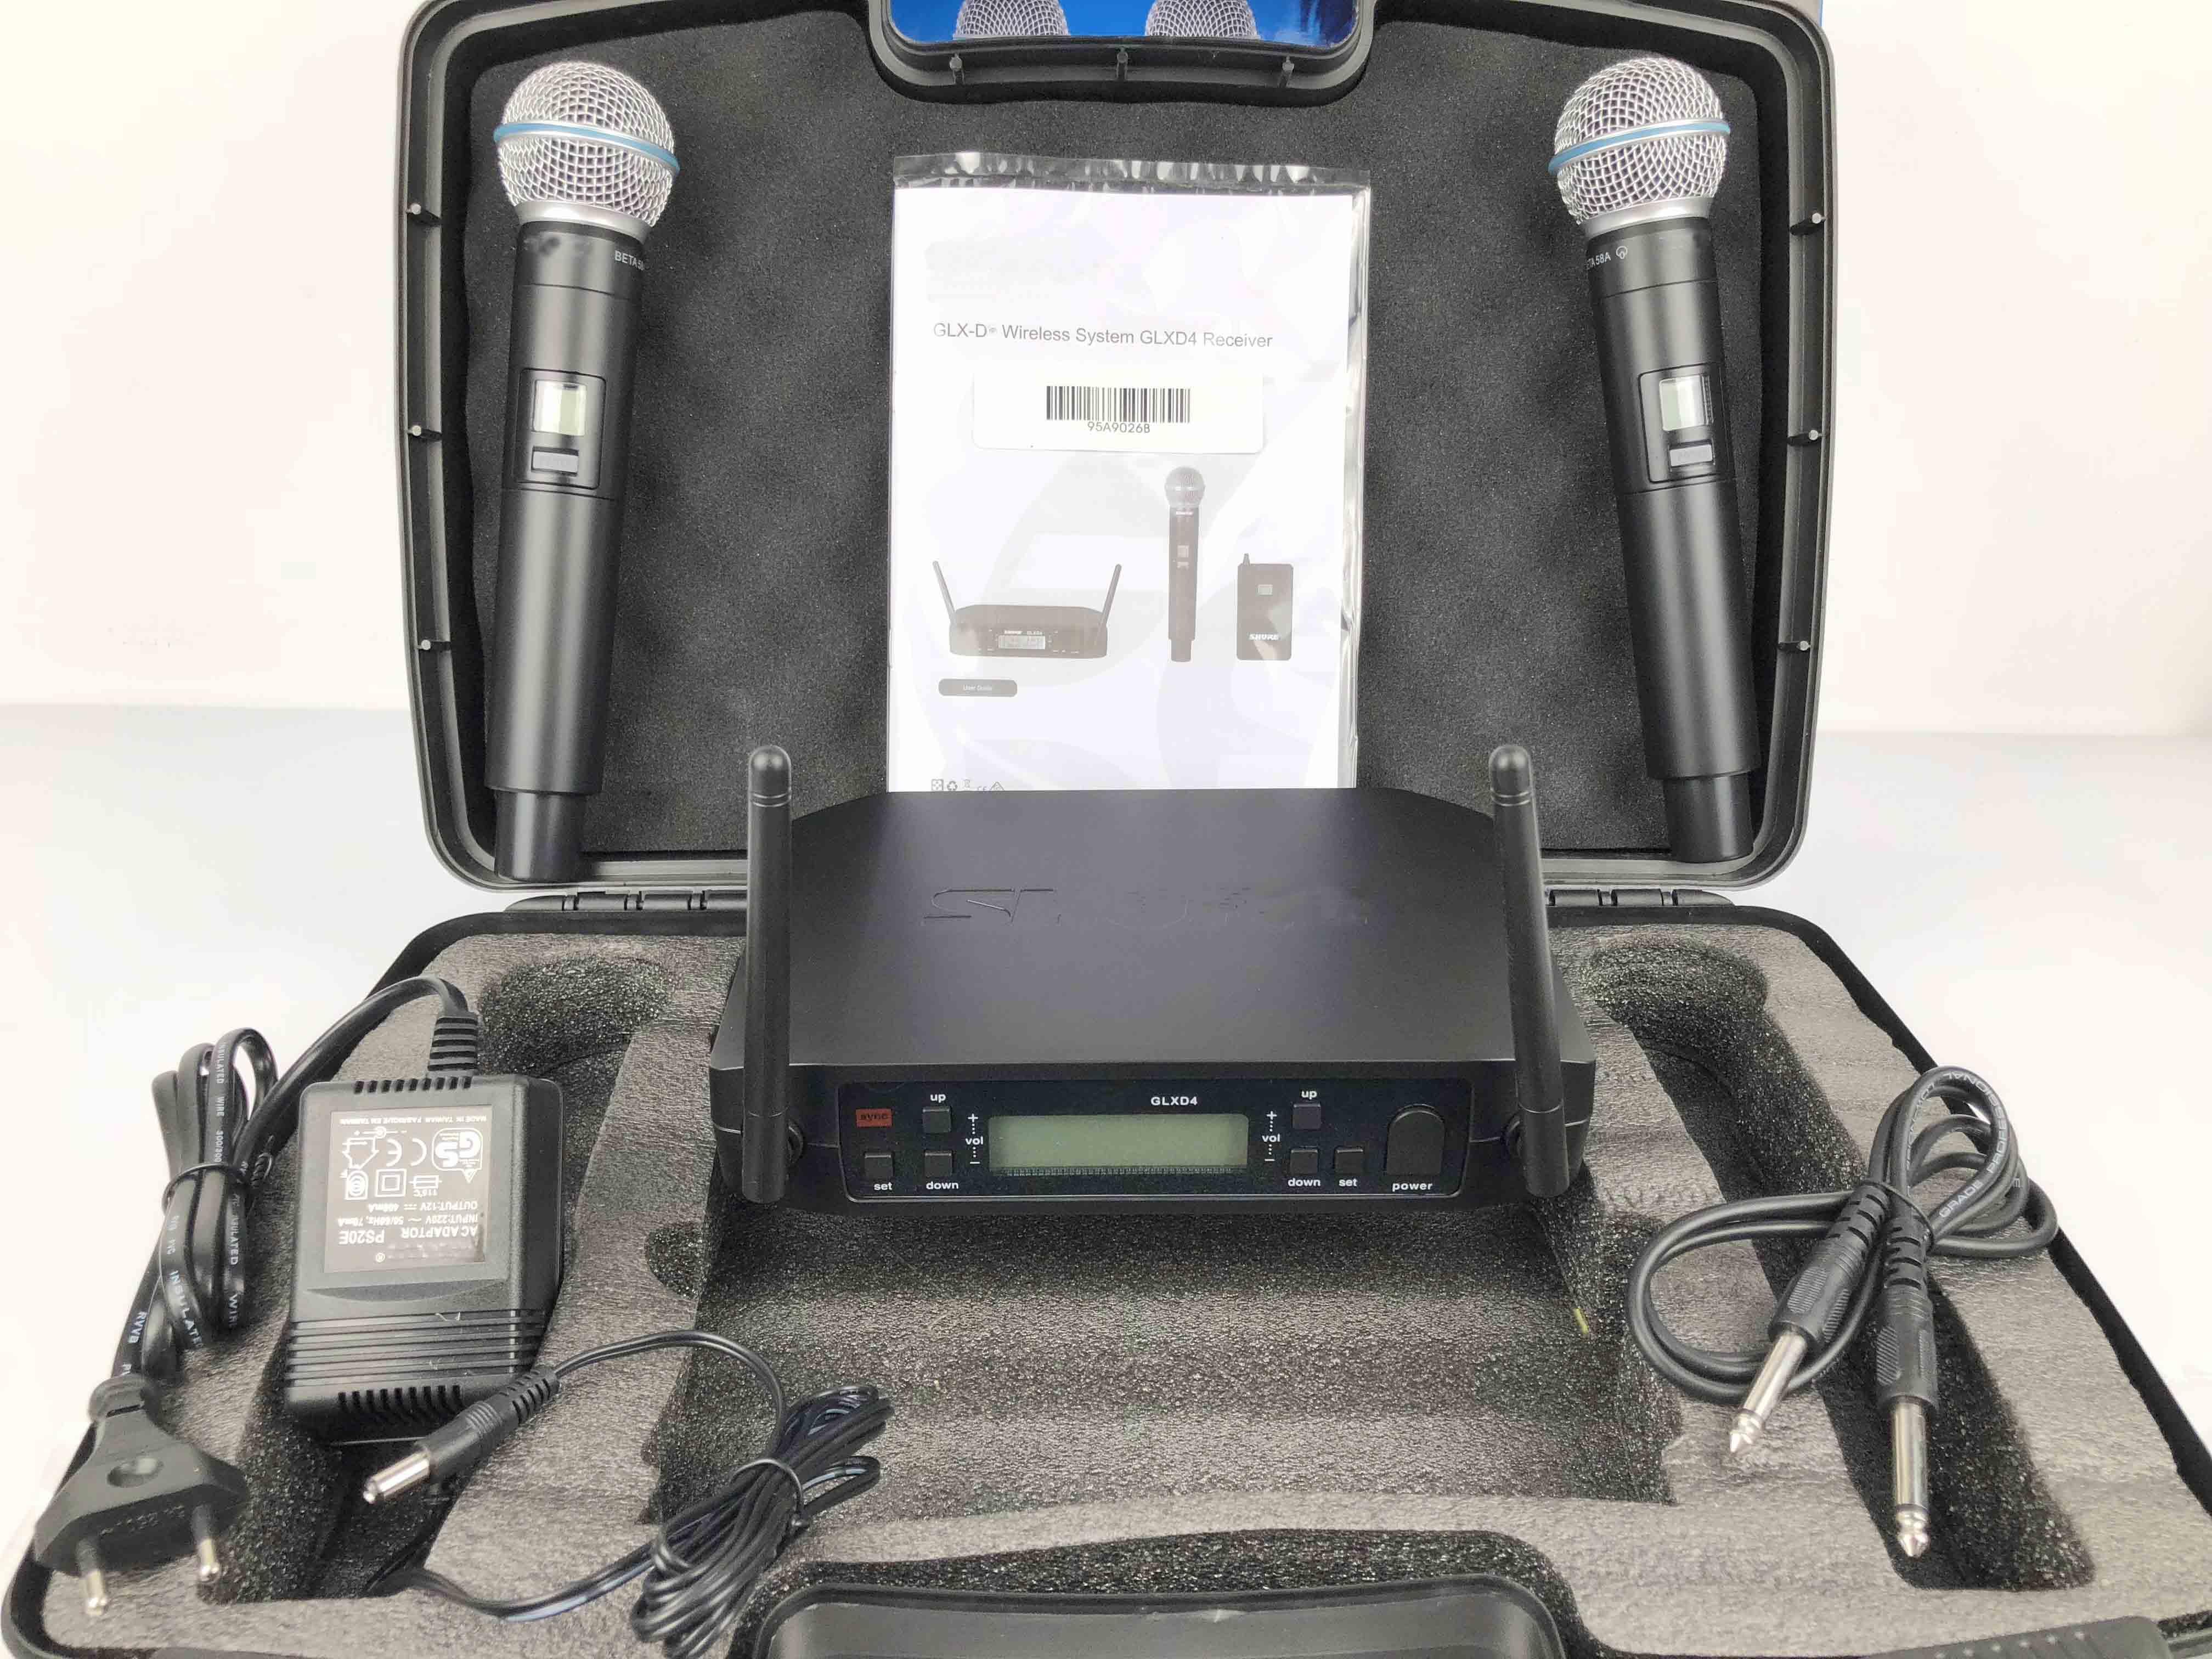 Hohe Qualität GLXD4 BETA58 UHF Wireless Mikrofon System Dual Kanal Drahtlose Mikrofon mit Flug Fall für heißer verkauf-in Mikrofone aus Verbraucherelektronik bei AliExpress - 11.11_Doppel-11Tag der Singles 1